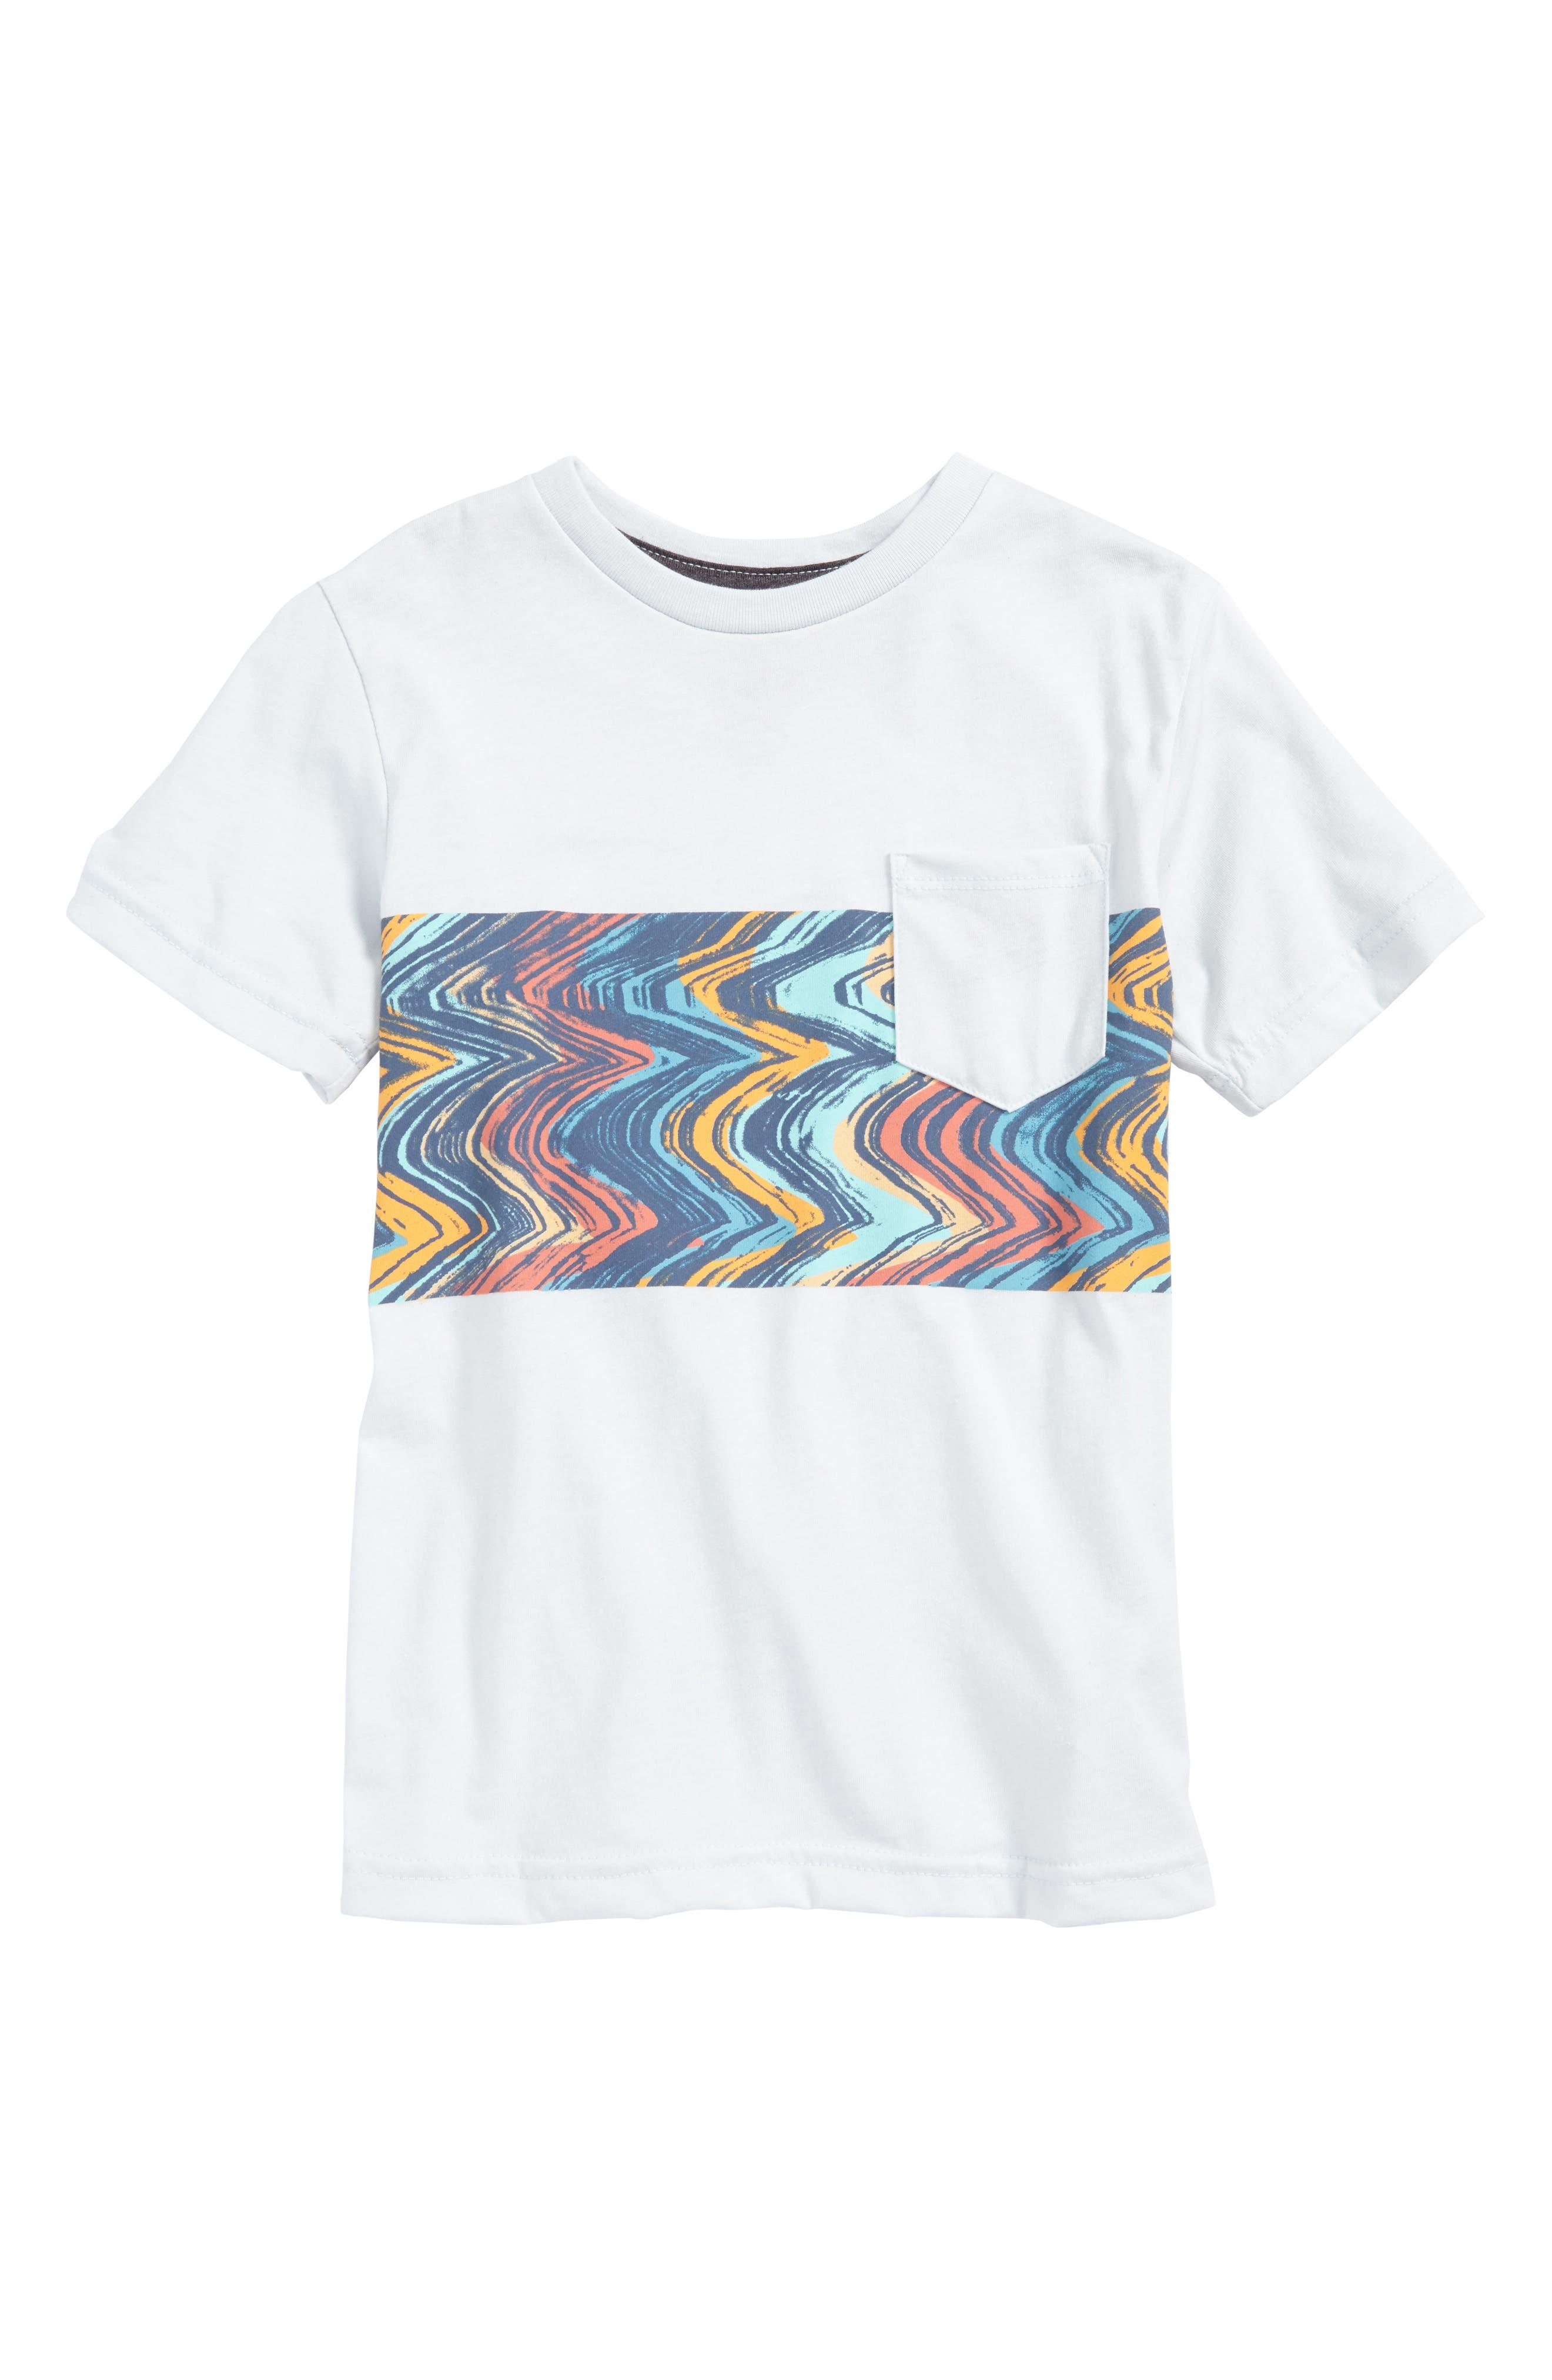 Volcom Lo-Fi Colorblock Pocket T-Shirt (Toddler Boys & Little Boys)